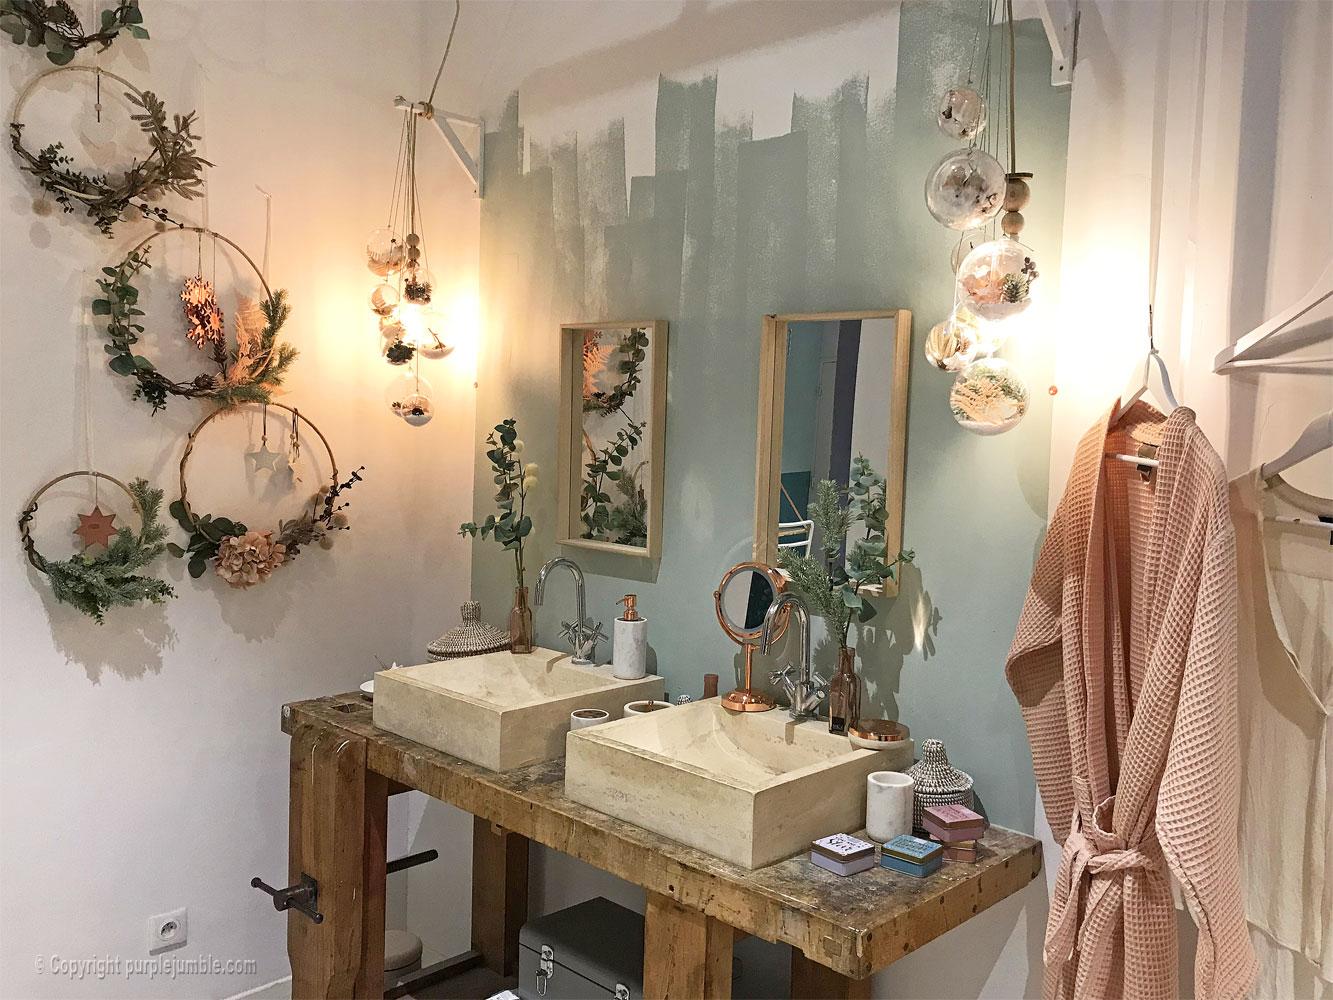 zodio noel 2018 deco maison lavabos